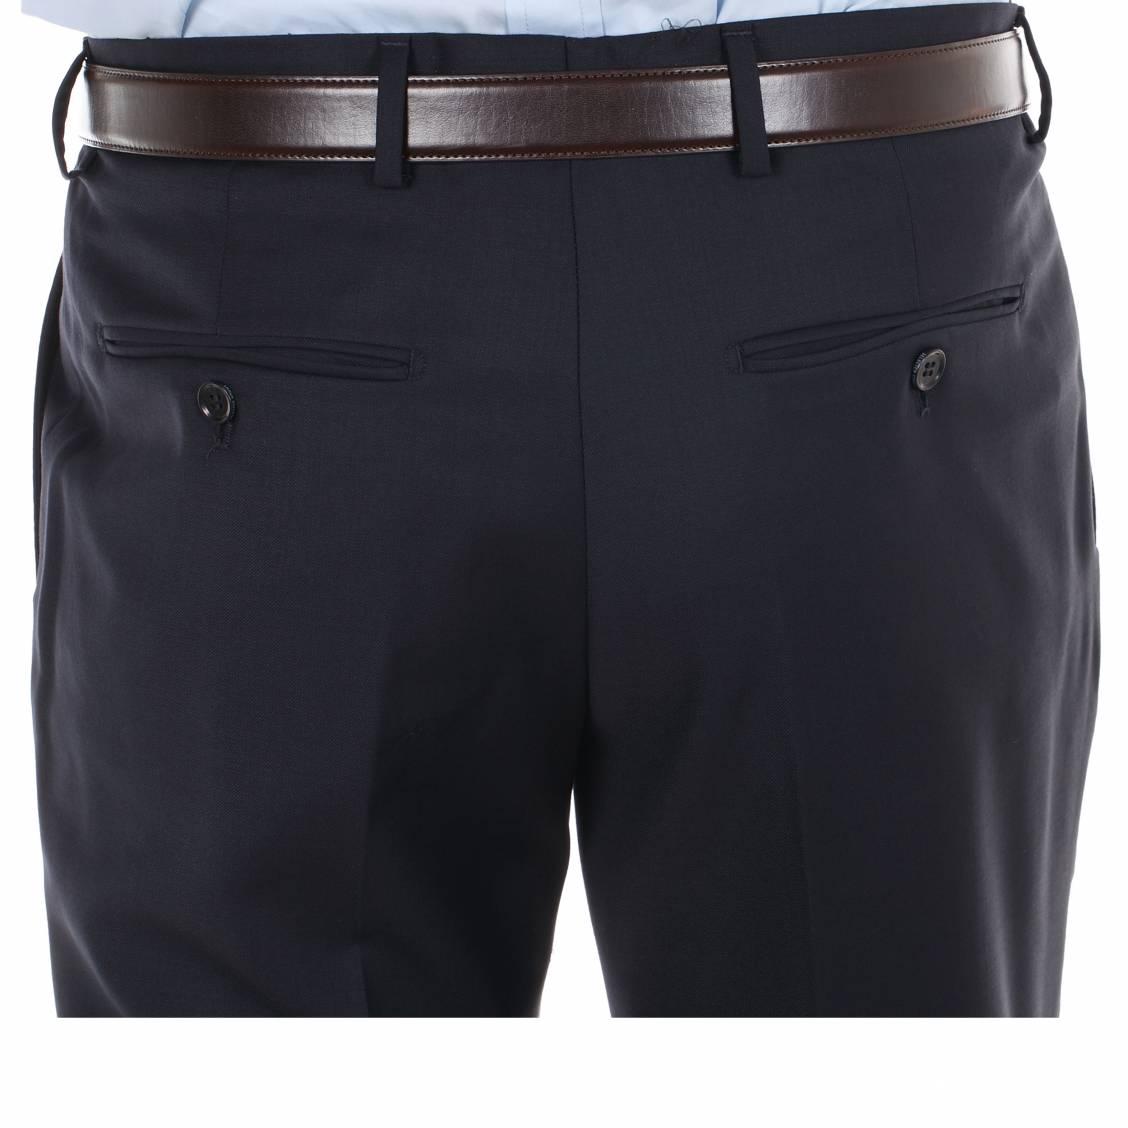 pantalon costume cintré bleu marine